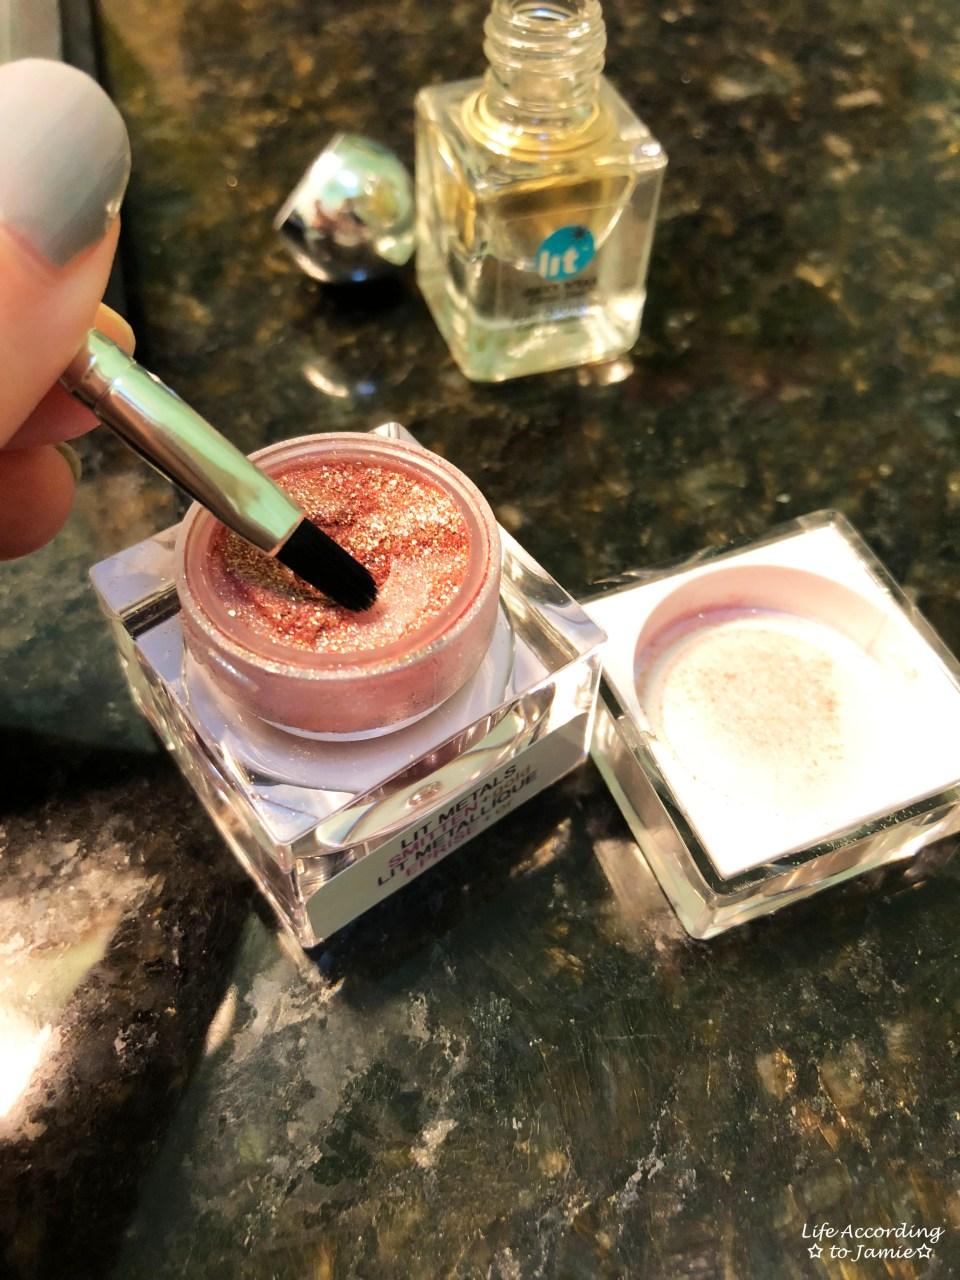 Lit Cosmetics - Smitten + Gold 2